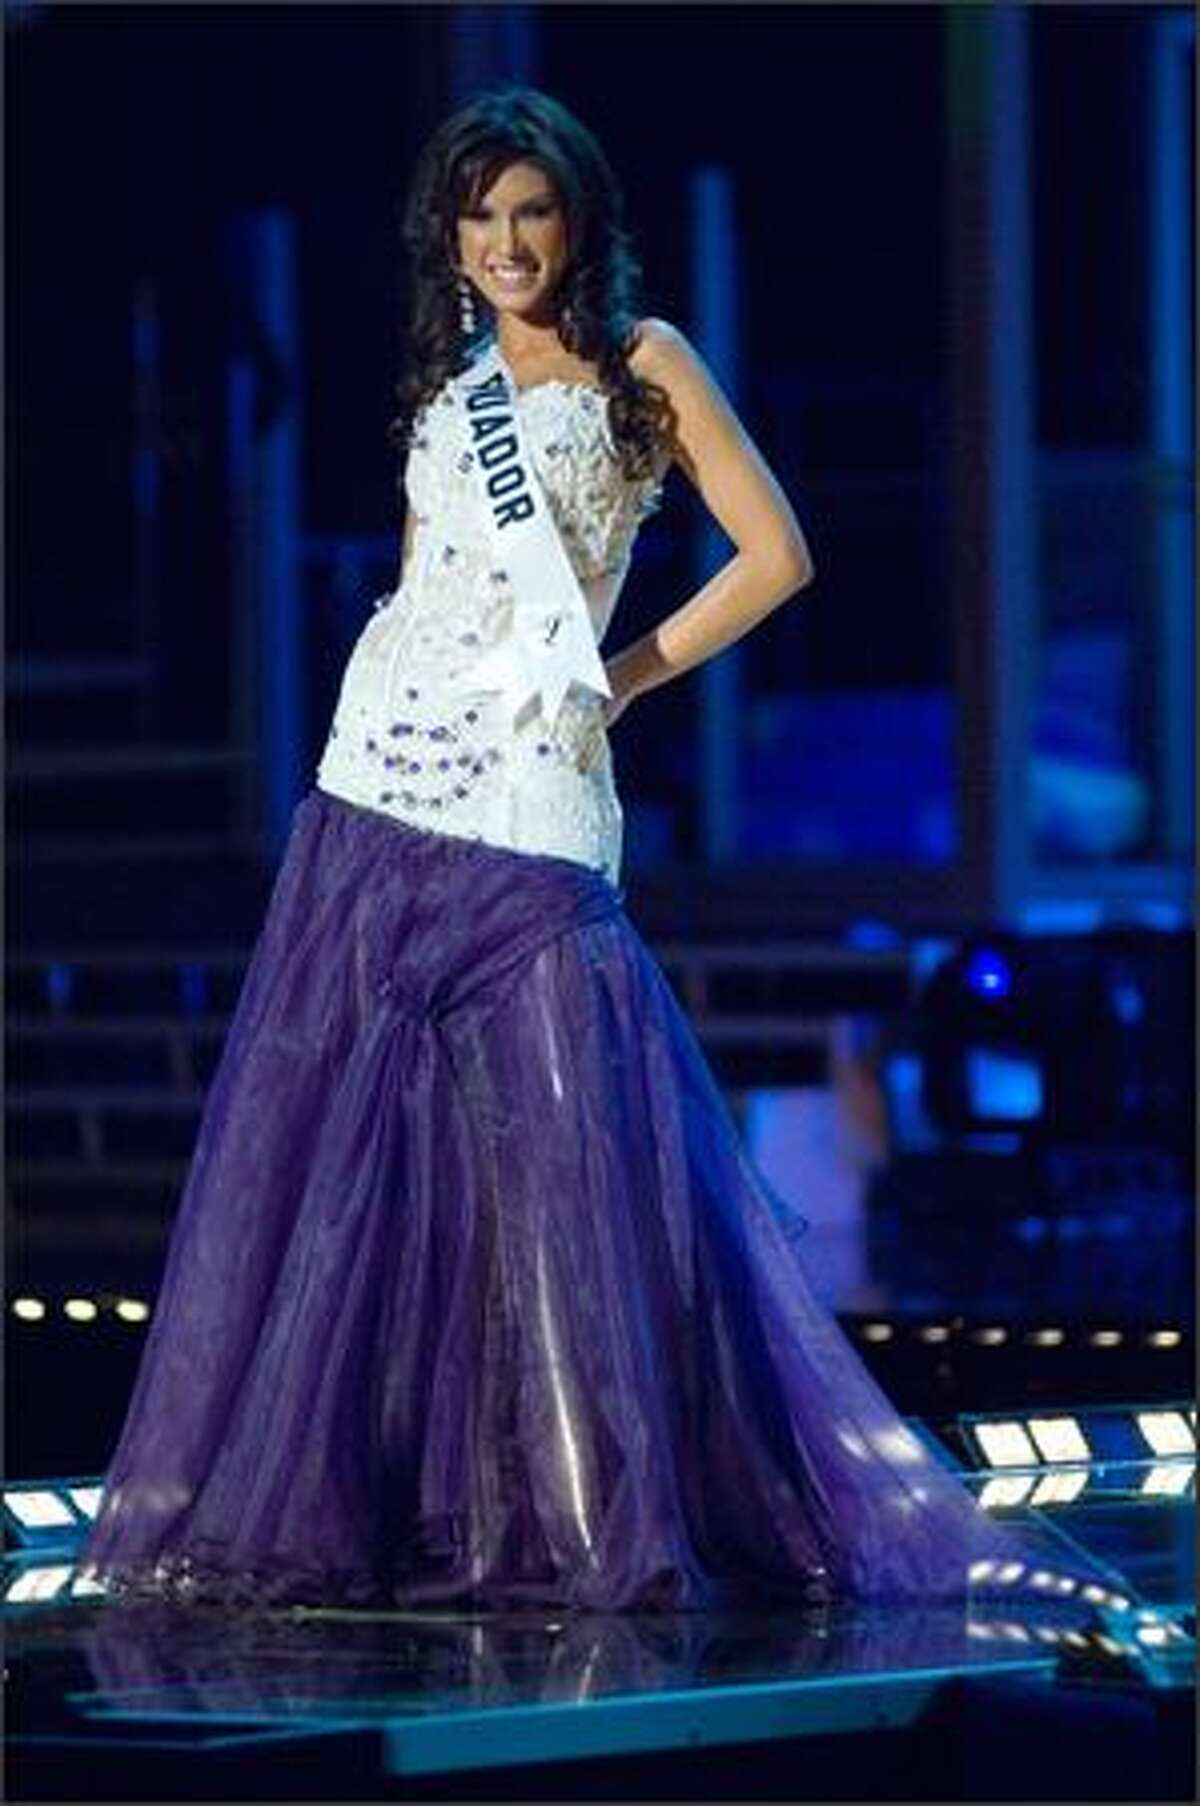 Lugina Cabezas, Miss Ecuador 2007.